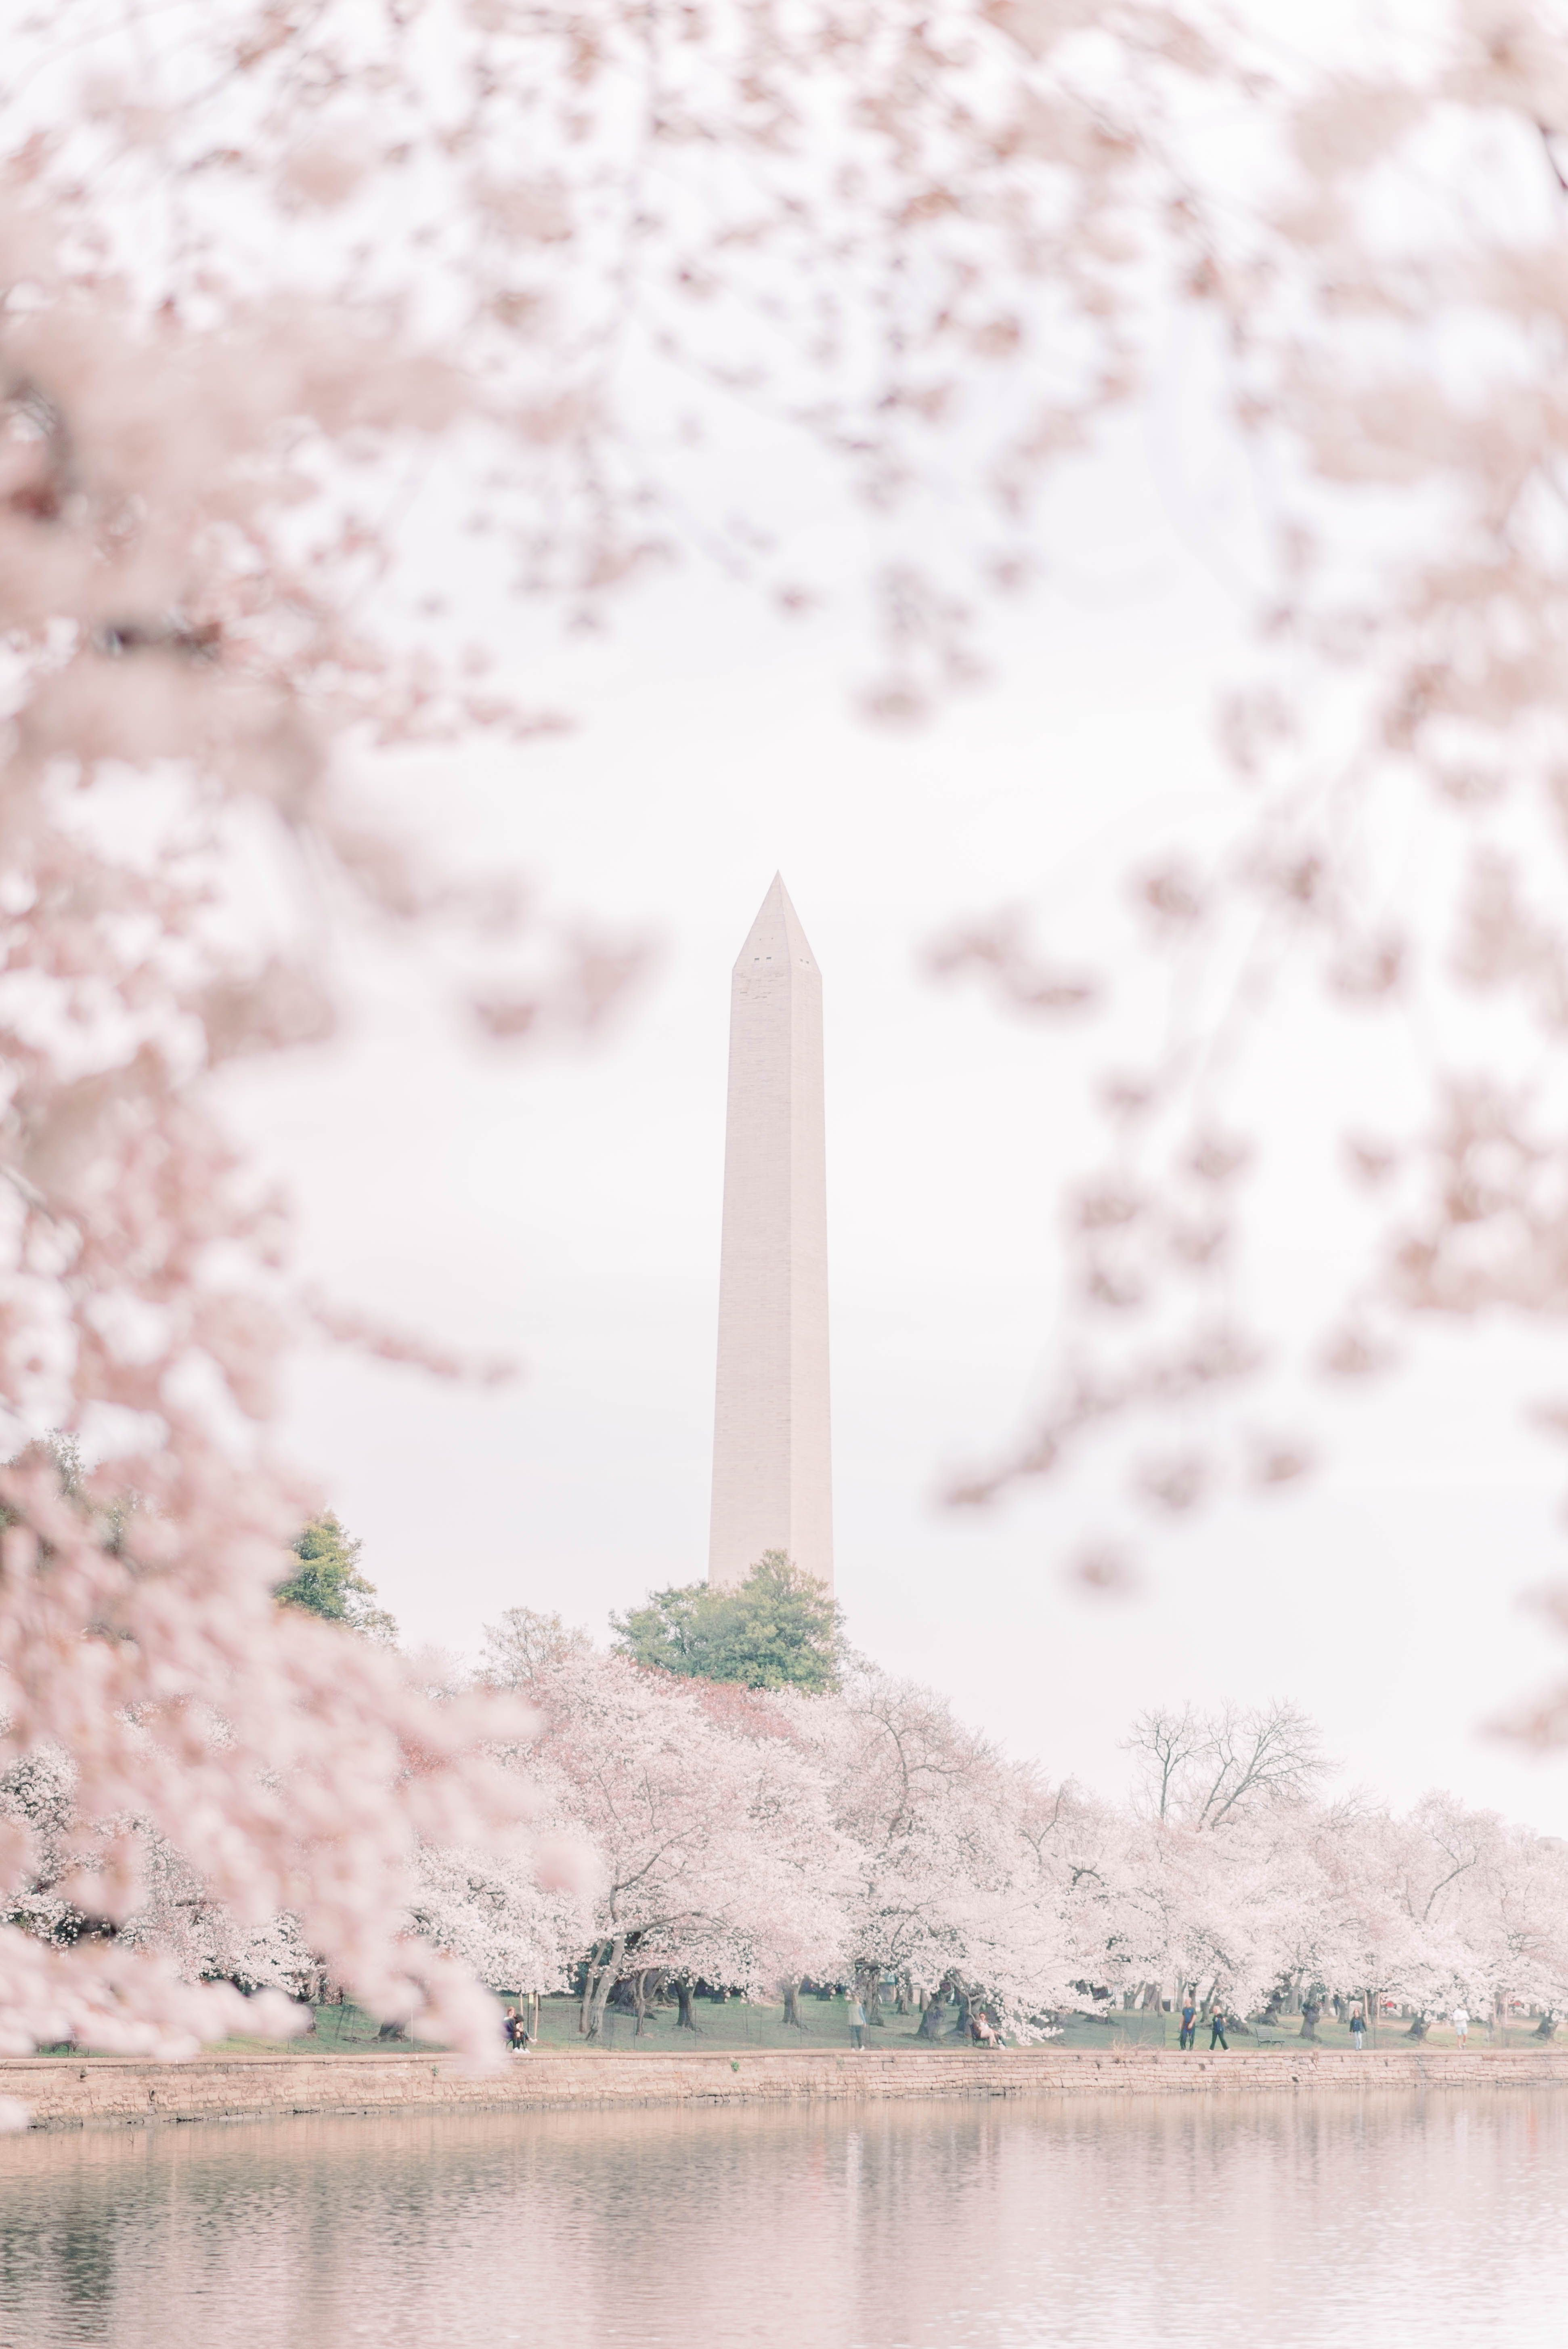 Cherry Blossoms At Dc Tidal Basin Cherry Blossom Blossom Tidal